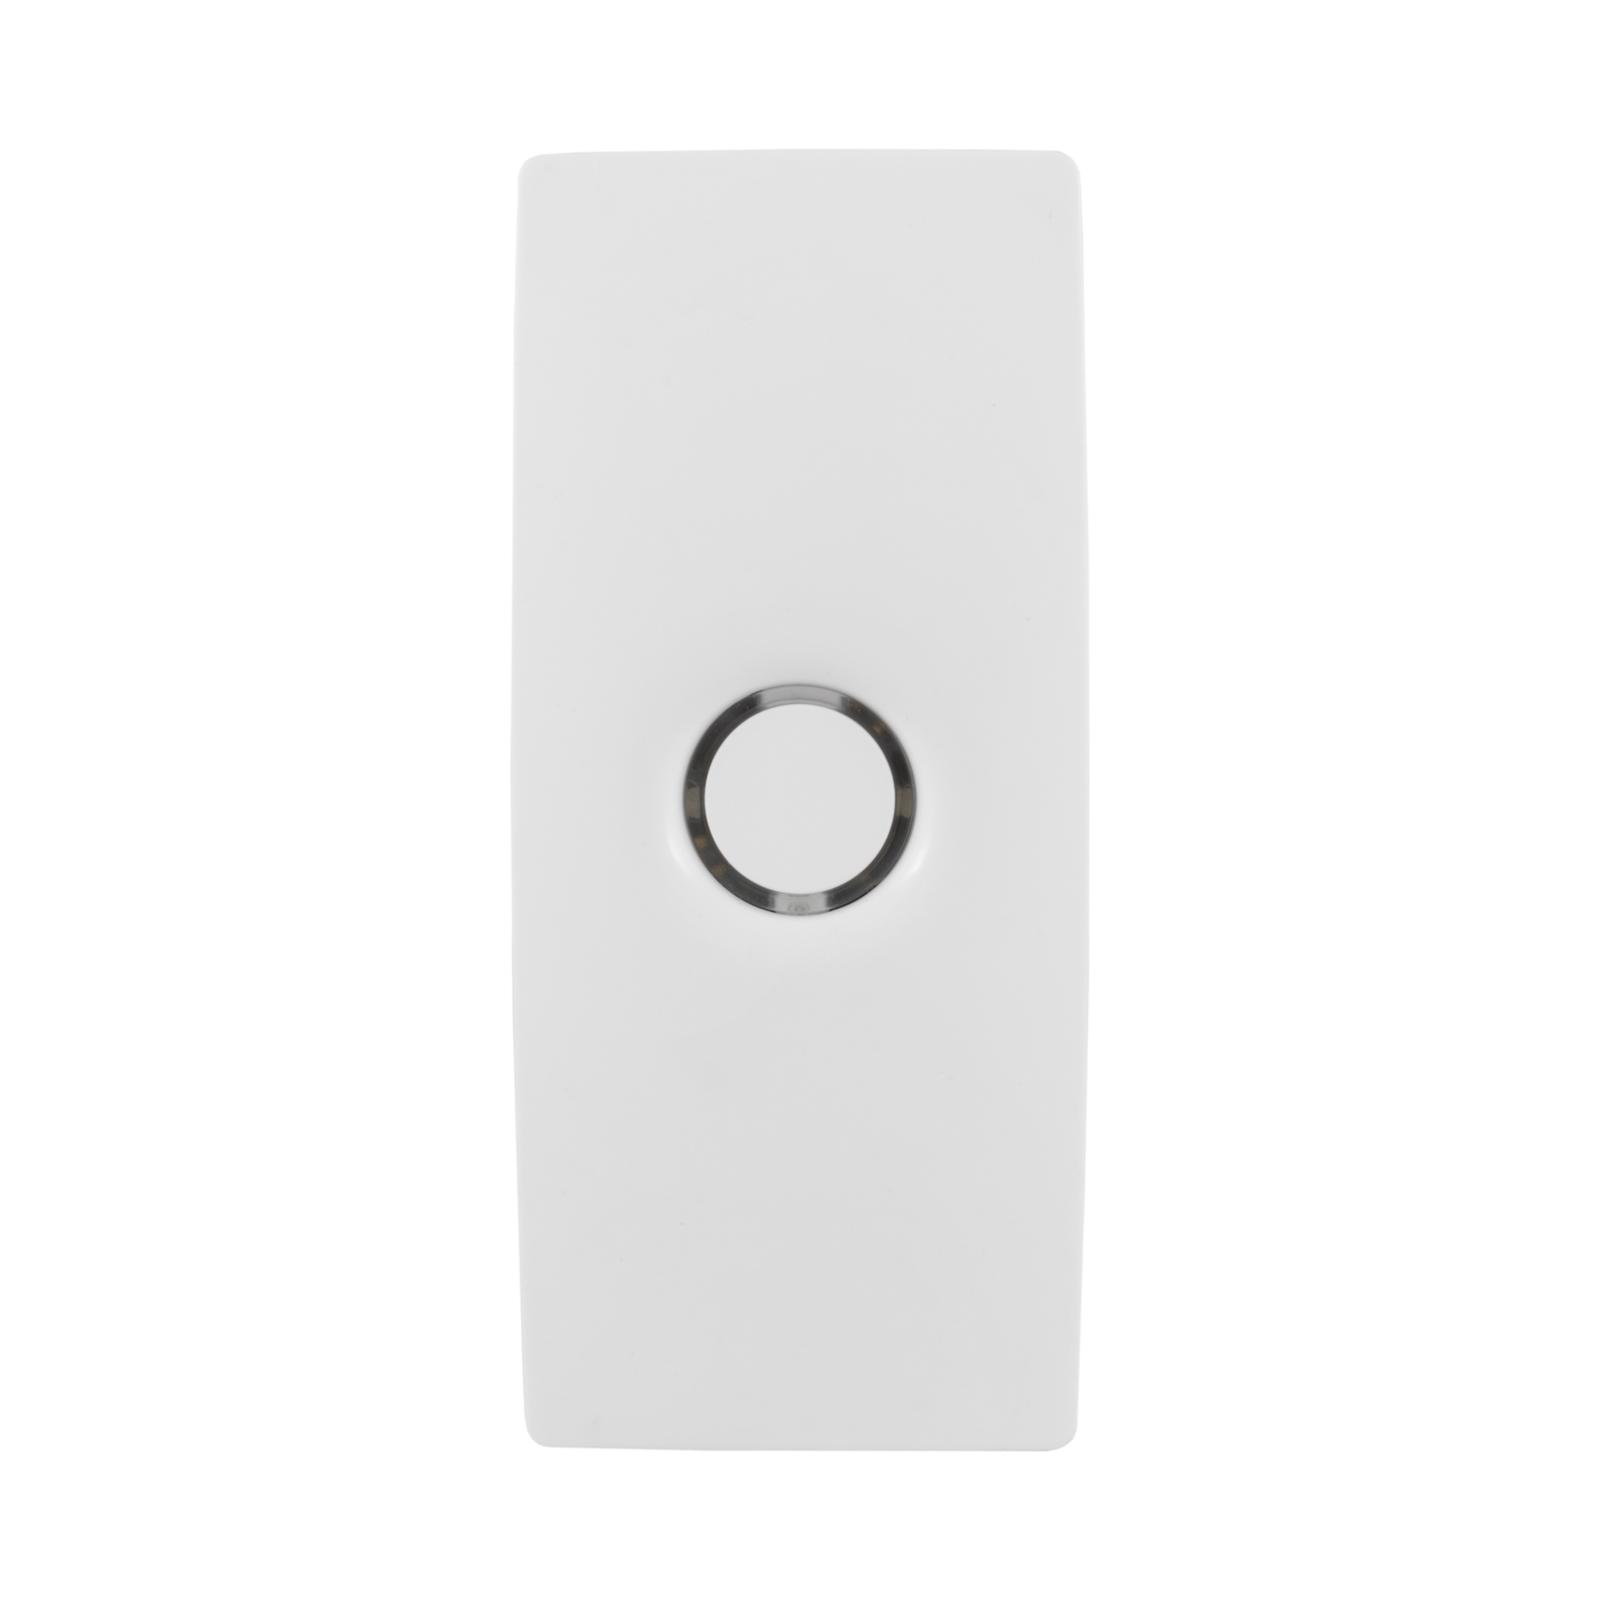 Gainsborough White Freestyle Wi-Fi Bridge And Door Sensor Kit